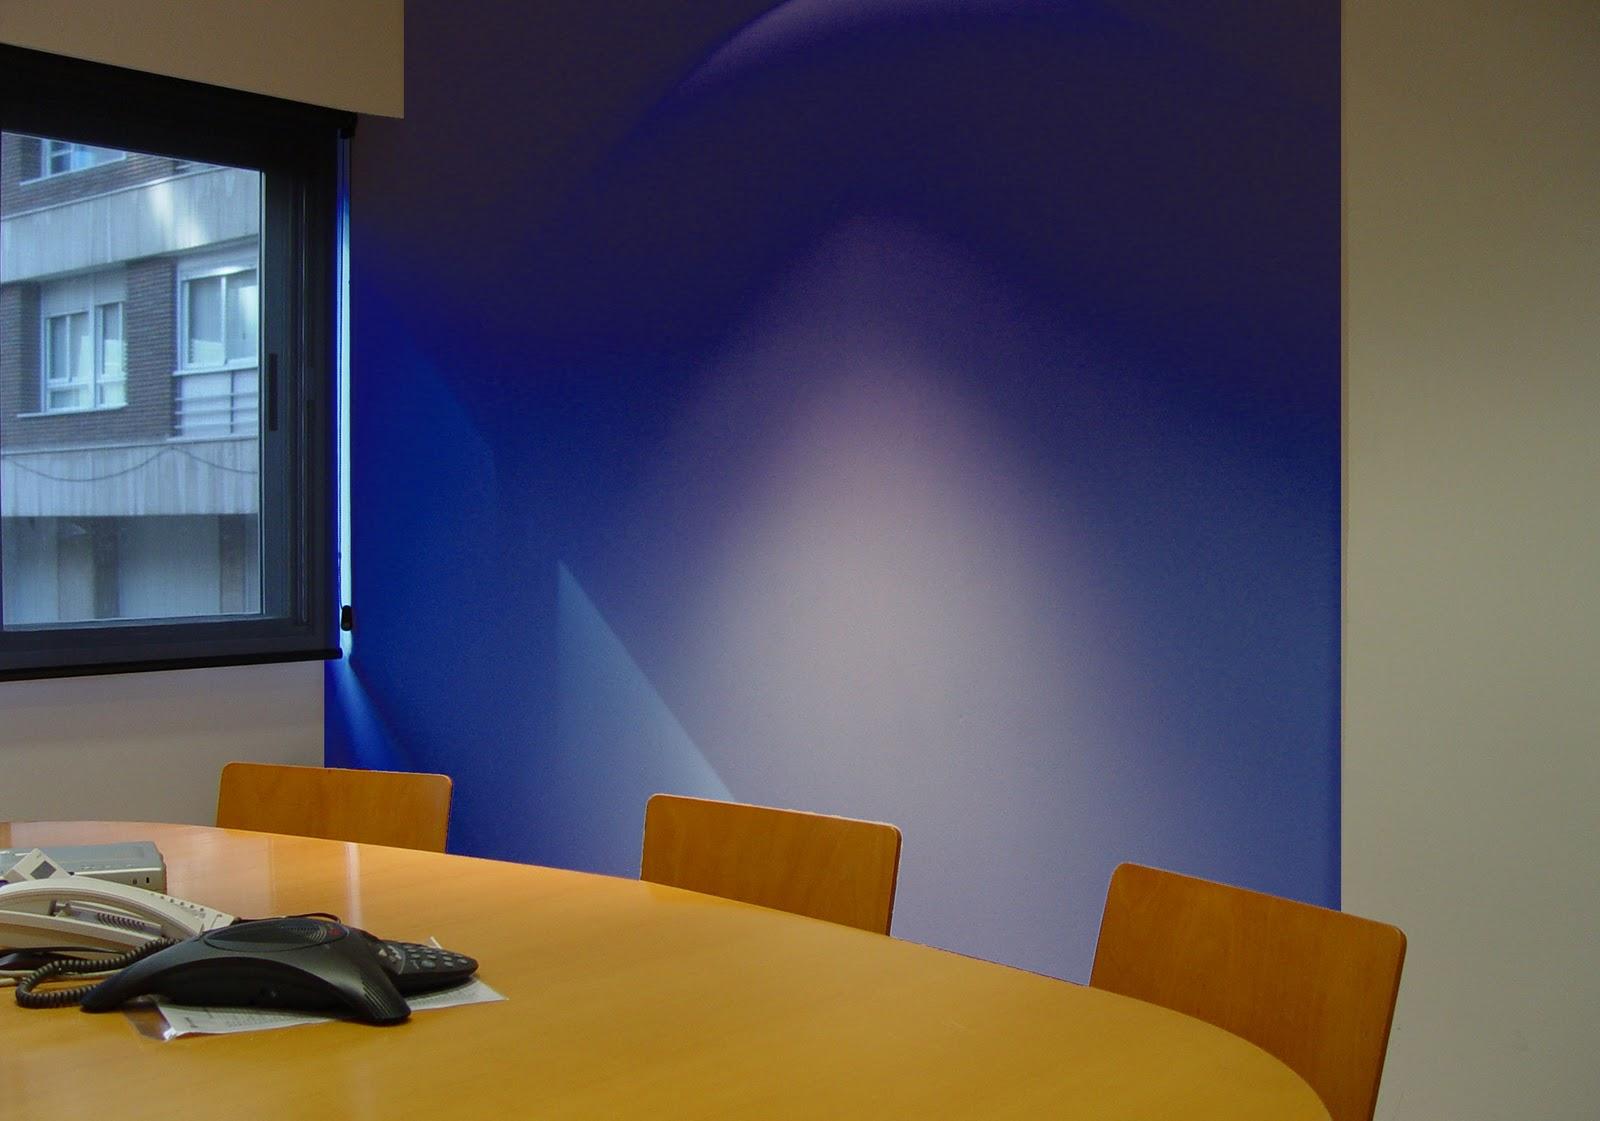 Reforma luisonrh for Color azul grisaceo para paredes